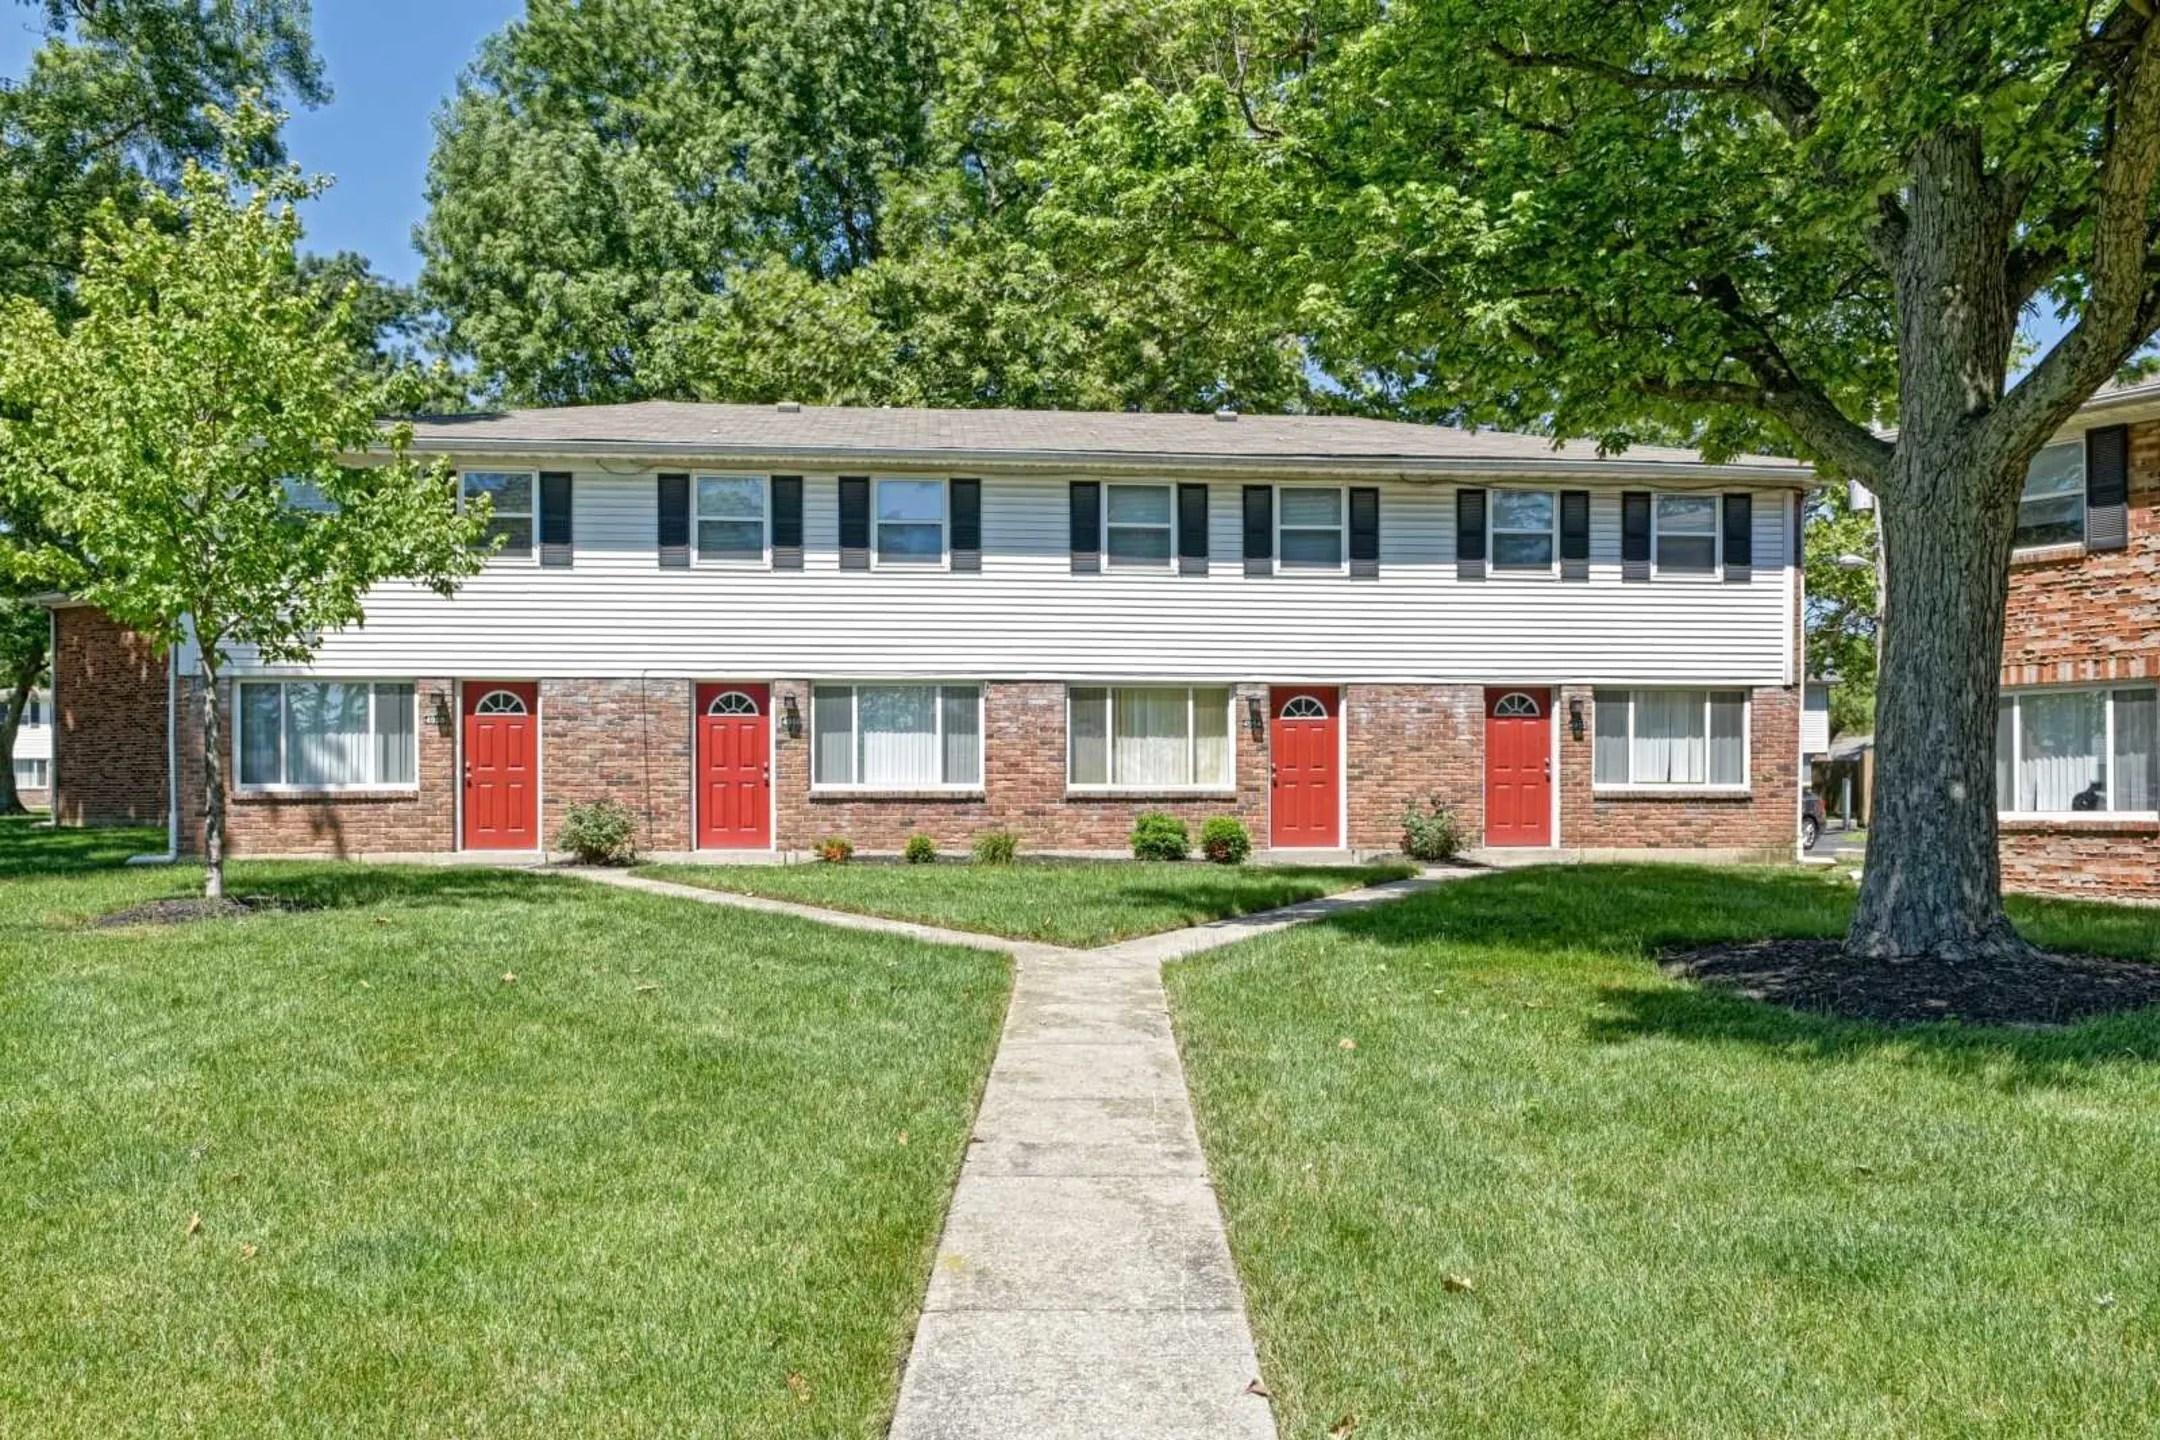 Galloway Village Apartments  Columbus OH 43228